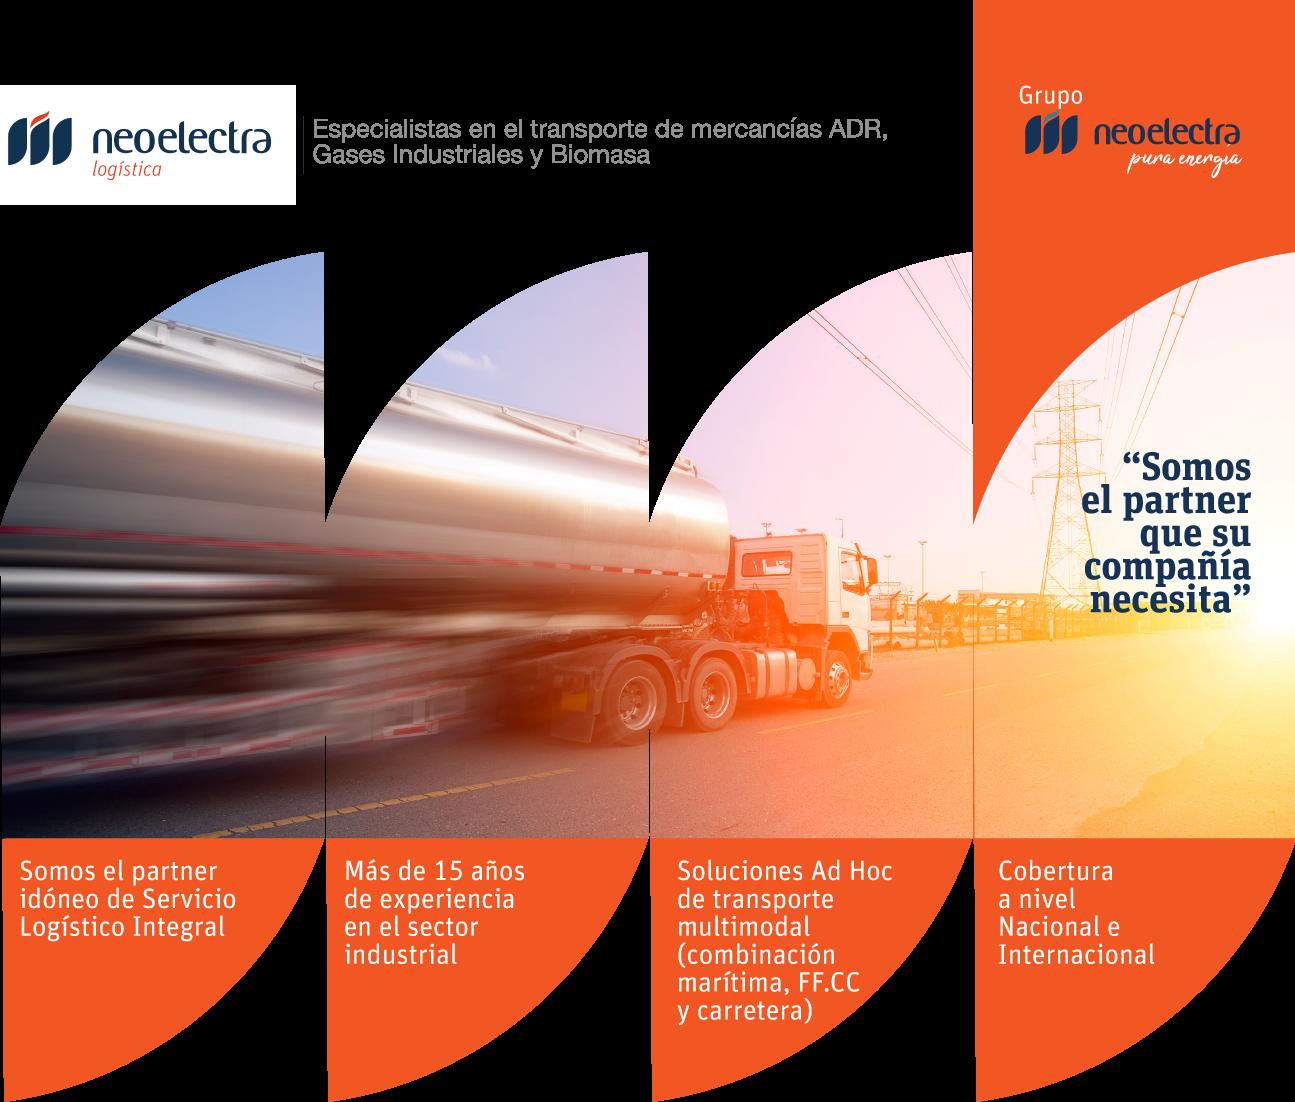 neoelectra-logistica-transporte-energia